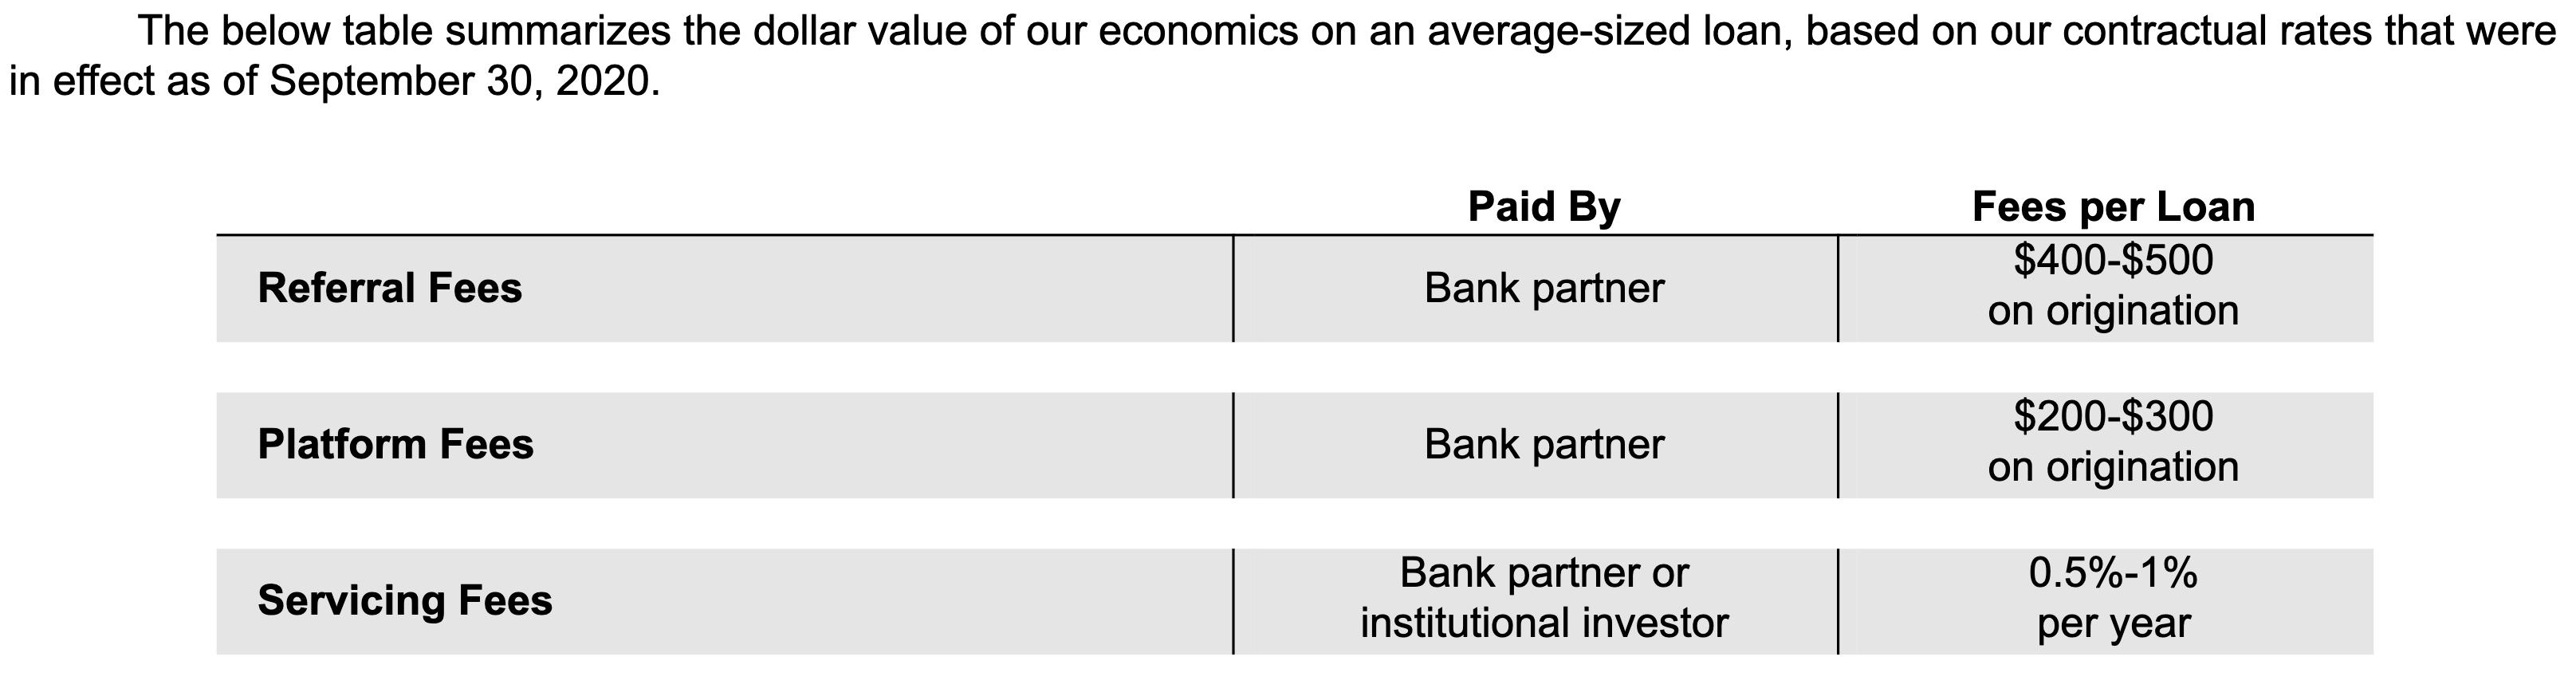 the-dollar-value-of-economics